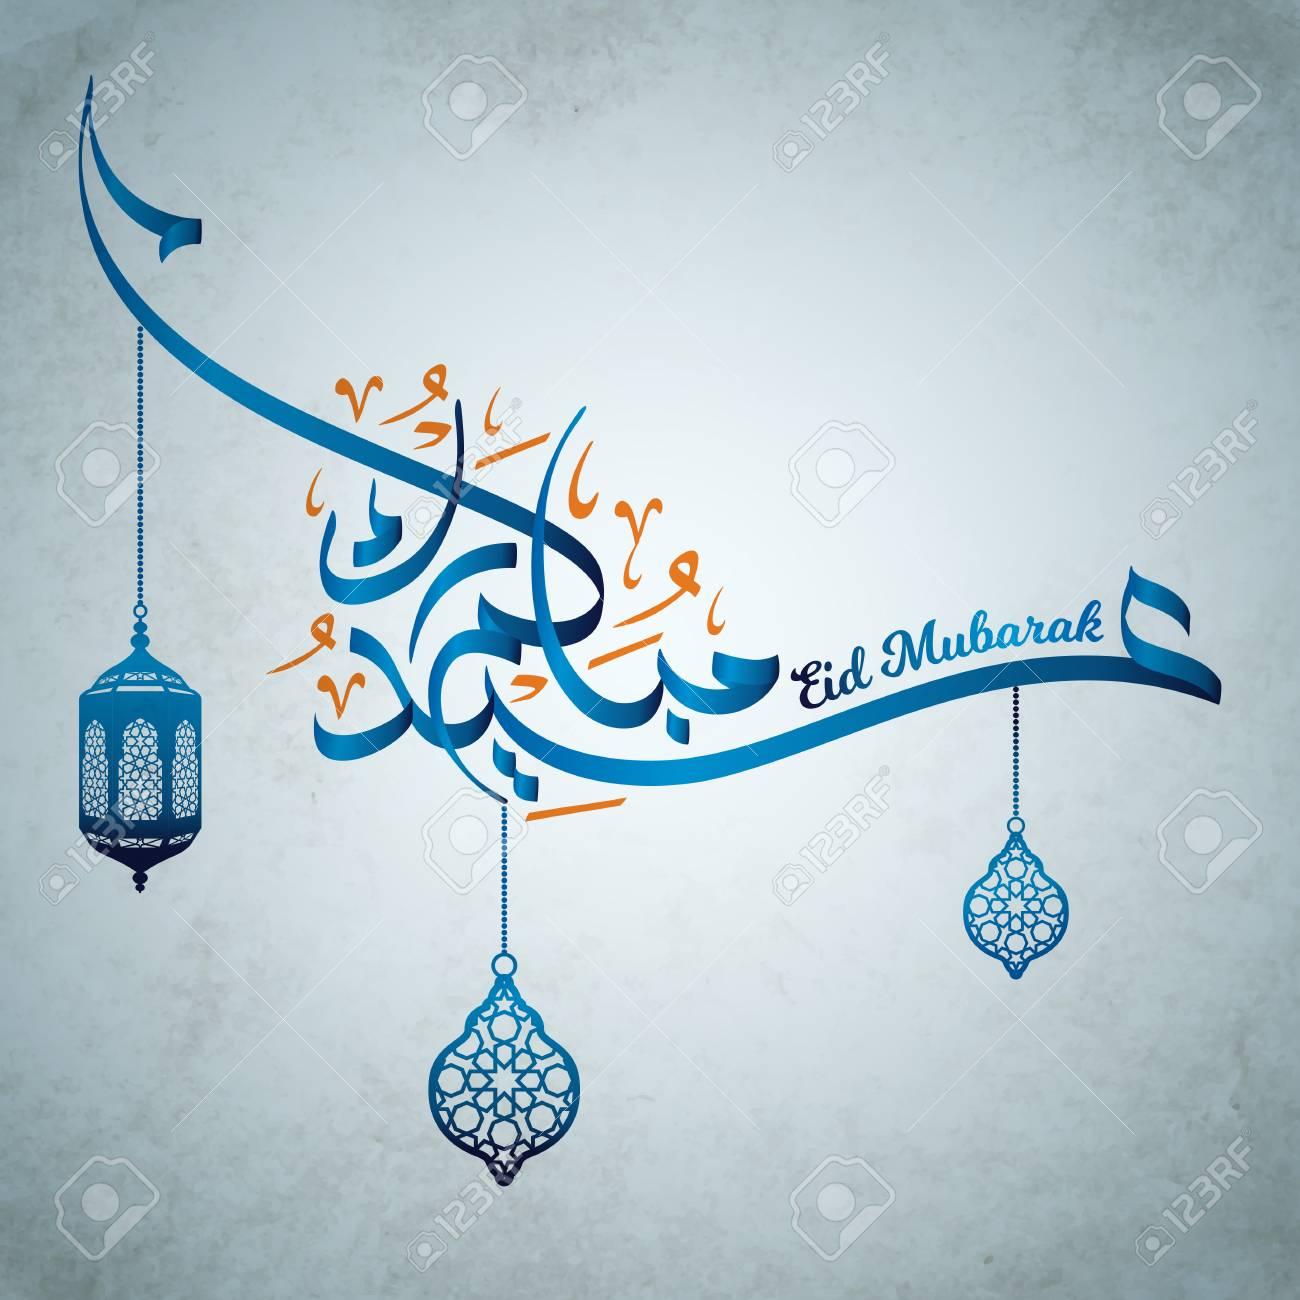 Eid Mubarak arabic calligraphy with lantern for islamic greeting - 101048261